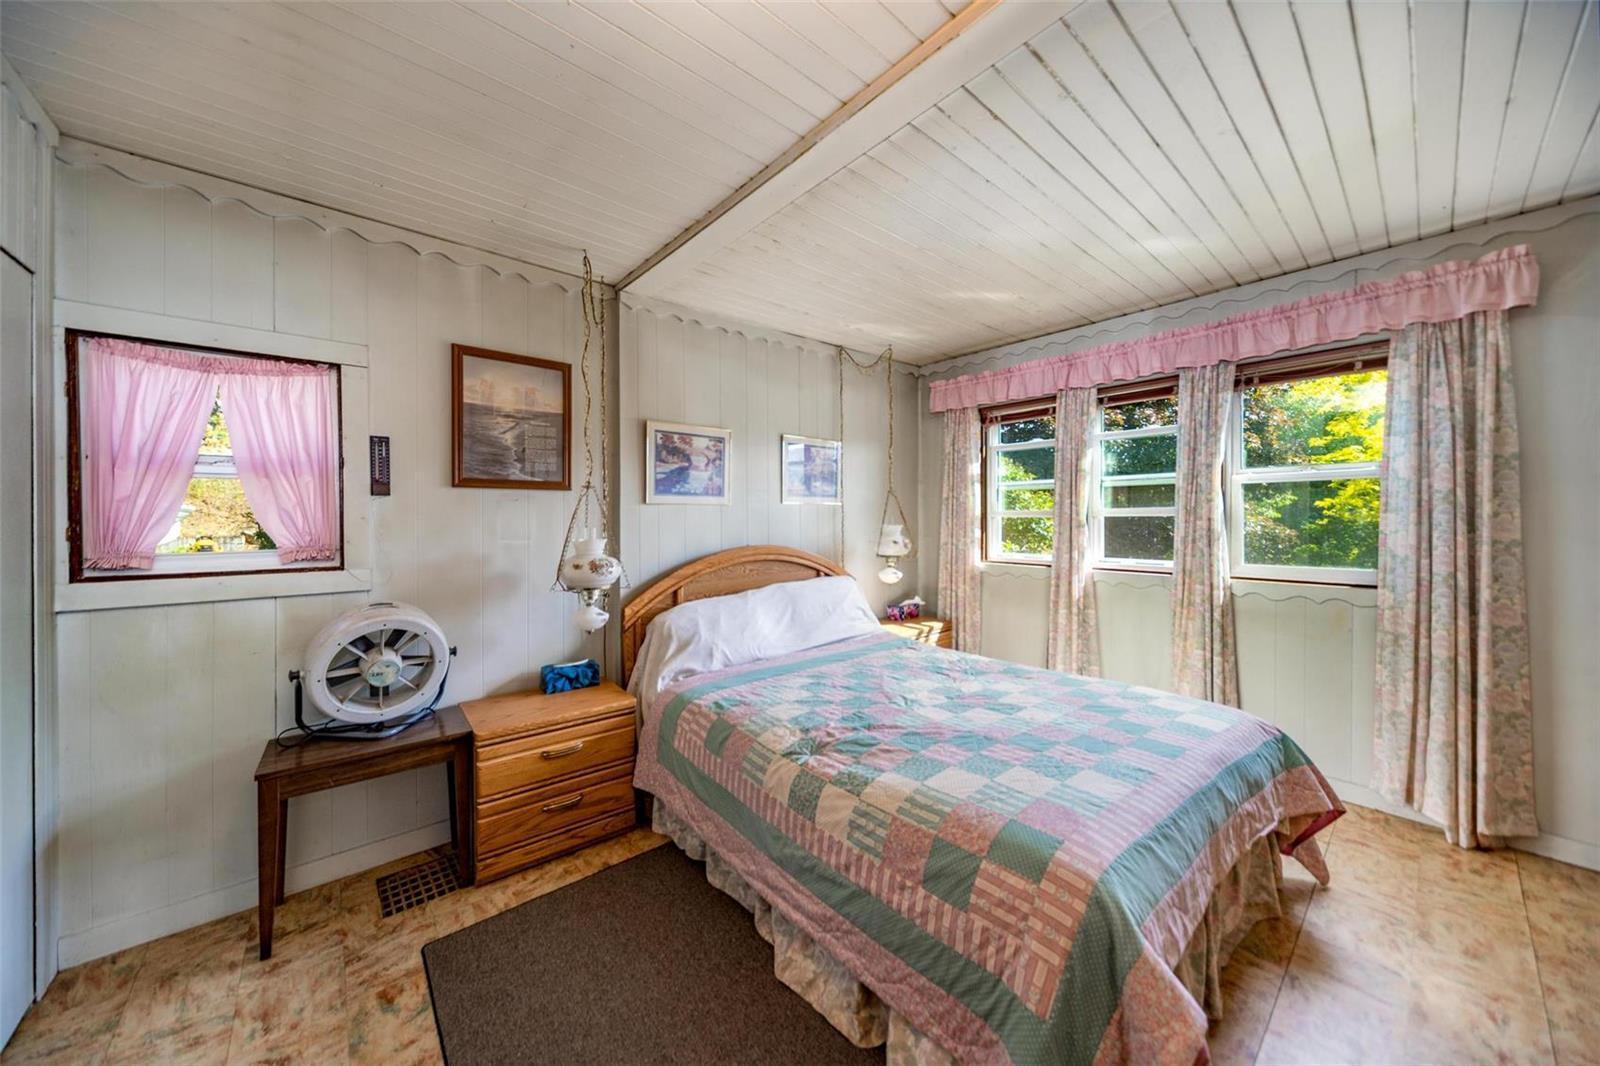 4602 Schubert Road,, Armstrong, British Columbia  V0E 1B4 - Photo 33 - 10232683